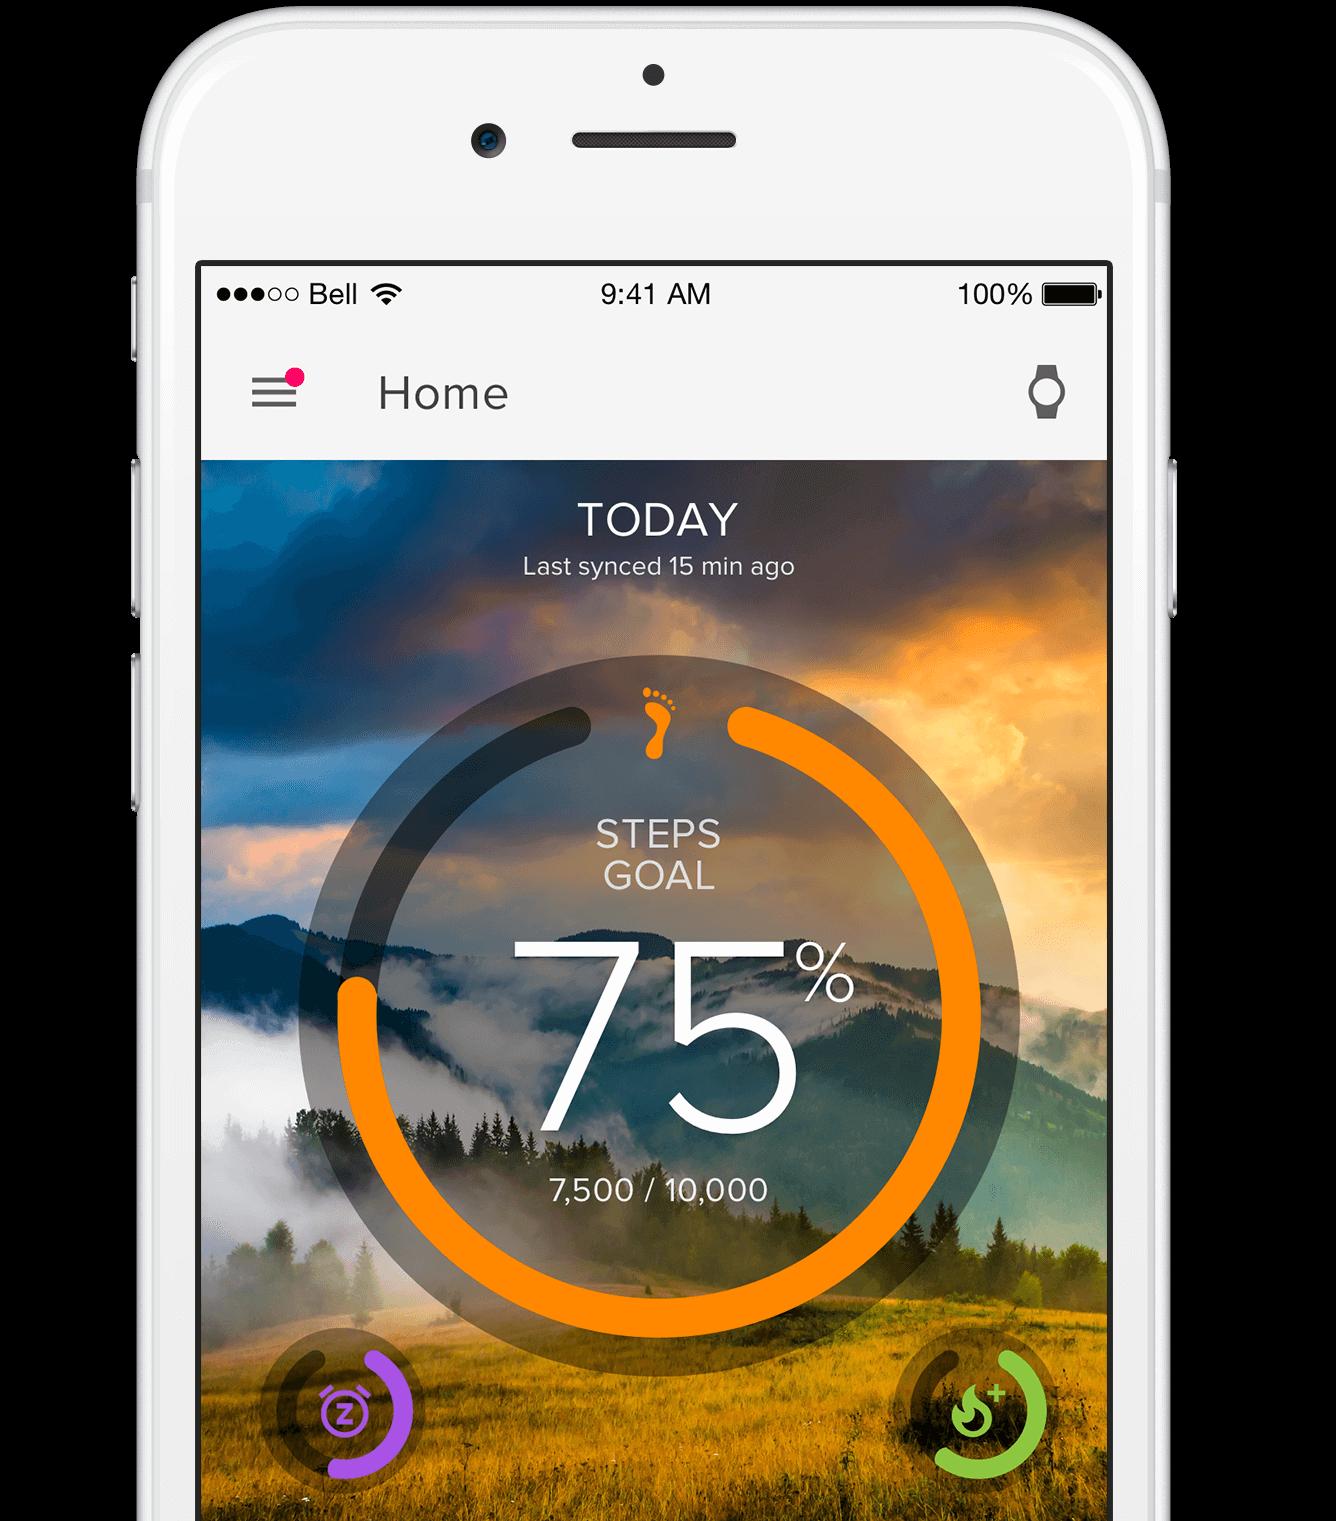 iFit Vue — Get the iFit app.